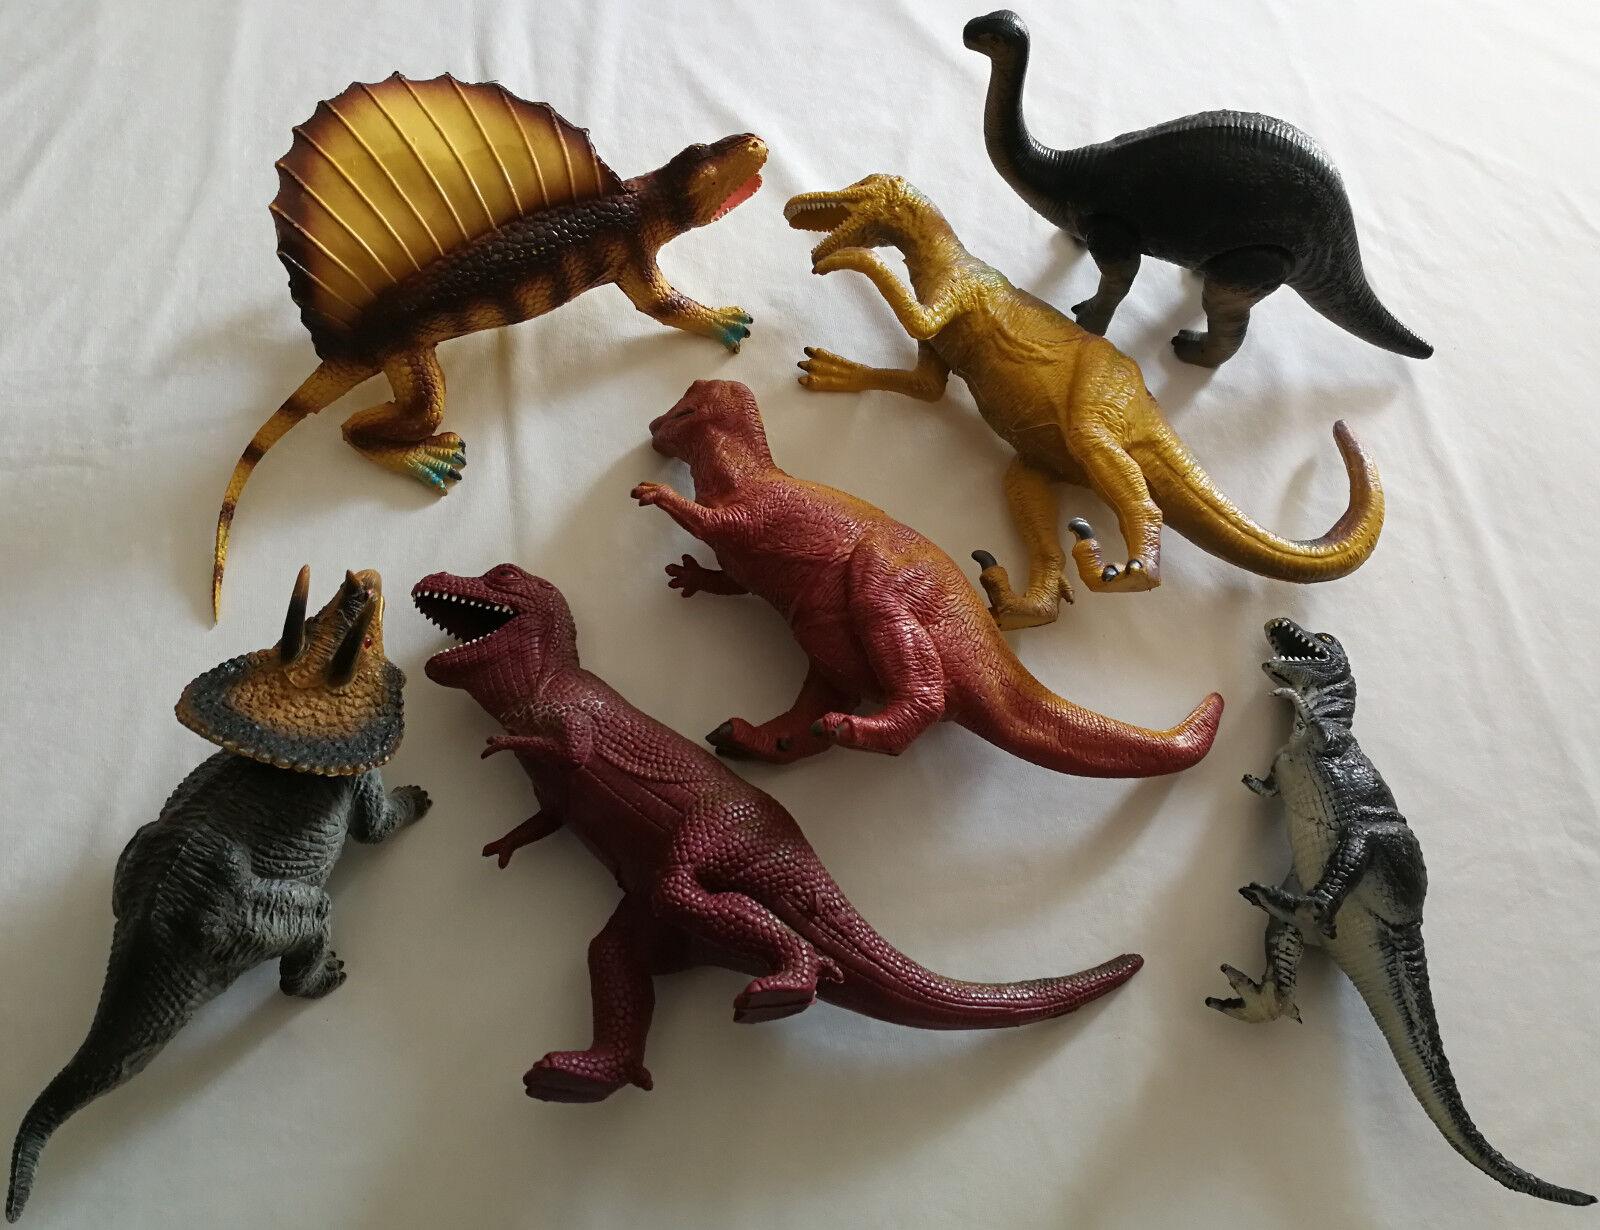 Dino (Dinosaurier) Figuren Triceratops 1991 T-Rex Edaphosaurus 1986 Velociraptor